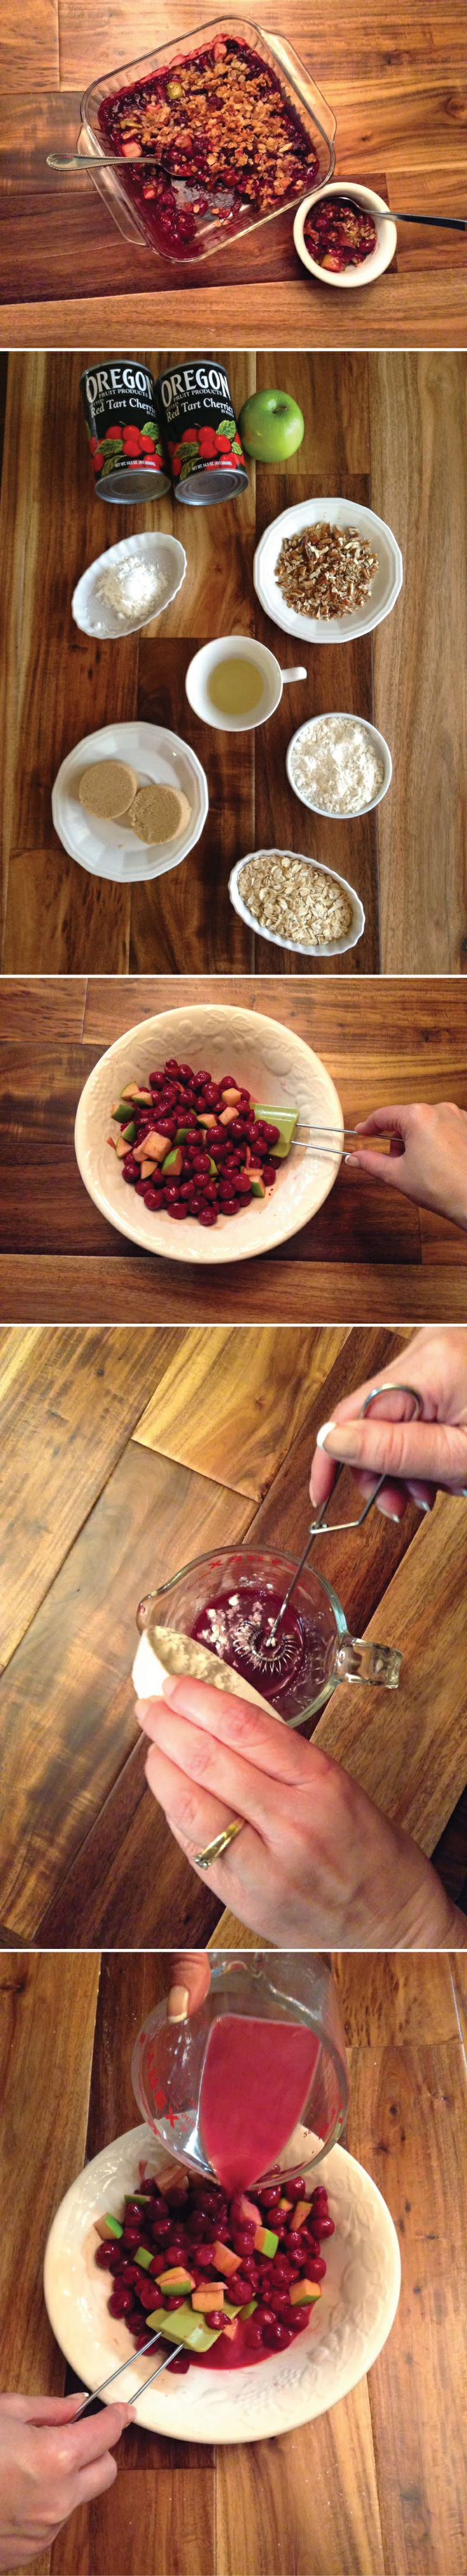 Cherry Crisp recipe made with Oregon Red Tart Cherries